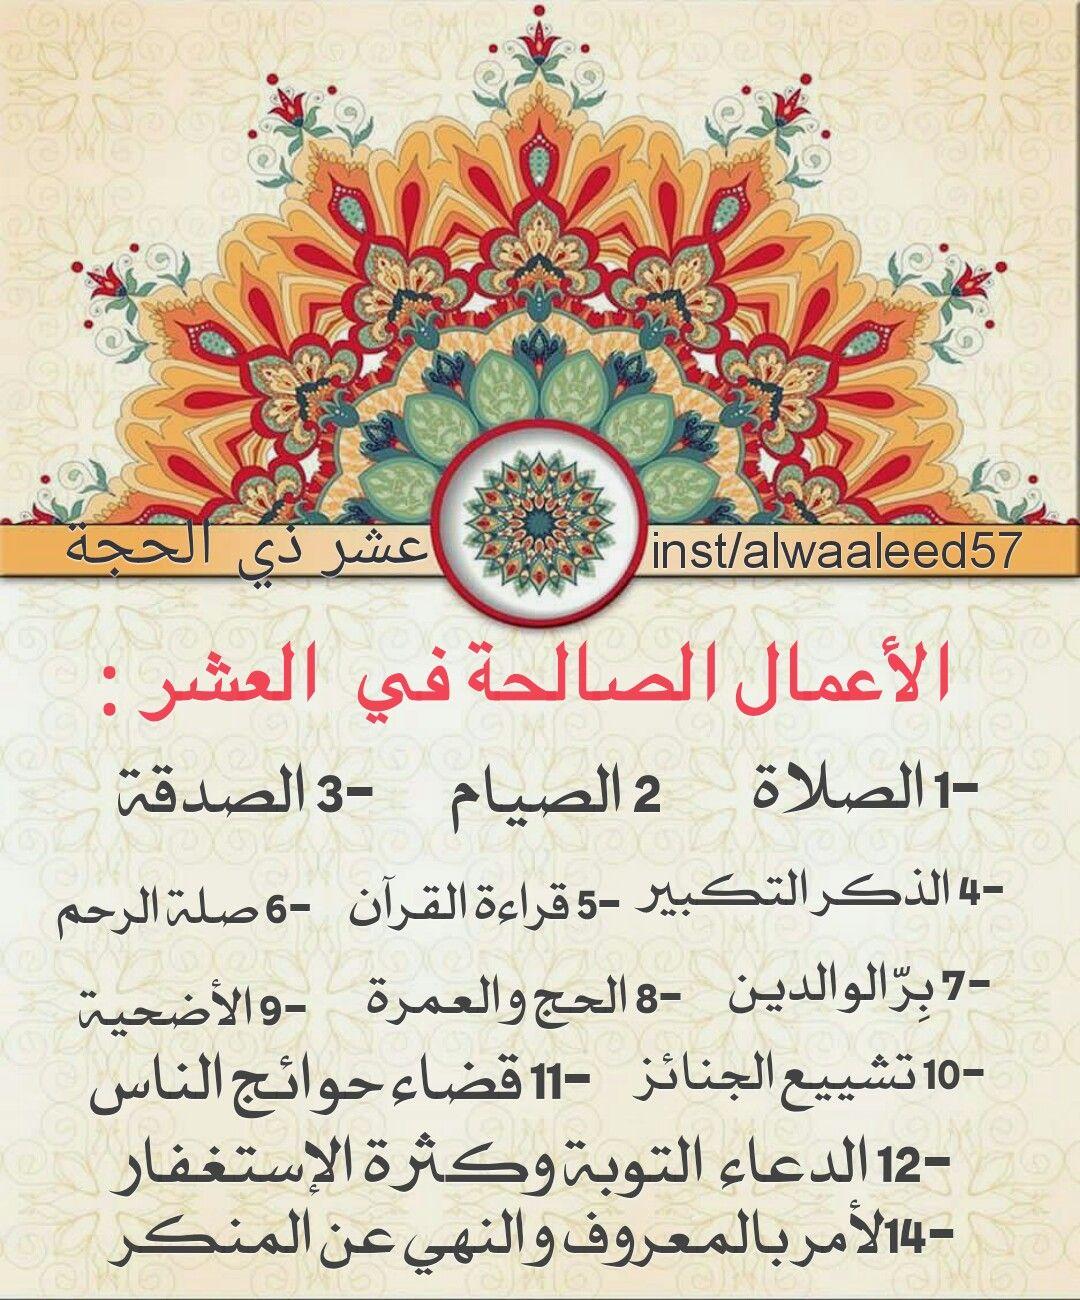 ﺍﻷﻋﻤﺎﻝ ﺍﻟﺼﺎﻟﺤﺔ ﻓﻲ ﺍﻟﻌﺸﺮ 1 ﺍﻟﺼﻼﺓ 2 ﺍﻟﺼﻴﺎﻡ 3 ﺍﻟﺼﺪﻗﺔ 4 ﺍﻟﺬﻛﺮ ﺍﻟﺘﻜﺒﻴﺮ 5 ﻗﺮﺍﺀﺓ ﺍﻟﻘﺮﺁﻥ 6 ﺻﻠﺔ ﺍﻟﺮﺣﻢ 7 ﺑ ﺮ Tapestry Quran Quotes Islam